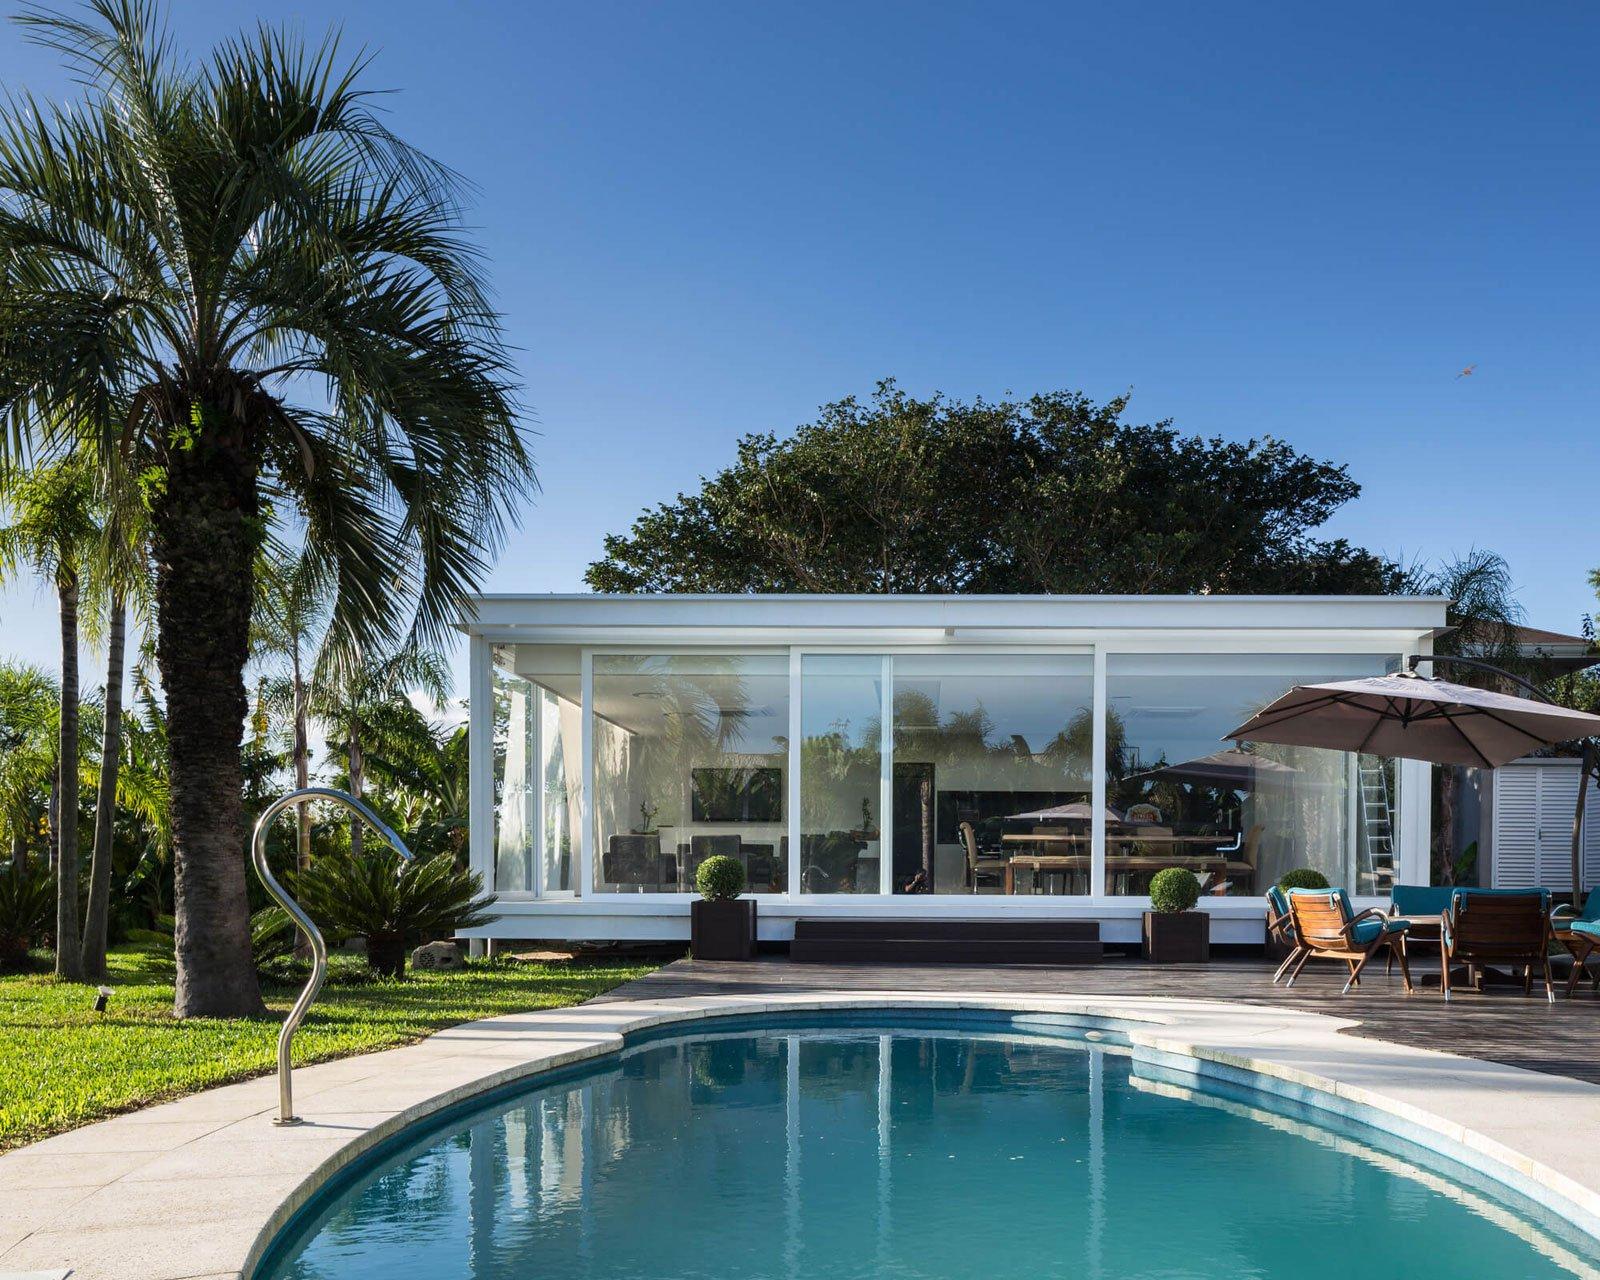 Pool-House-in-Porto-Alegre-02